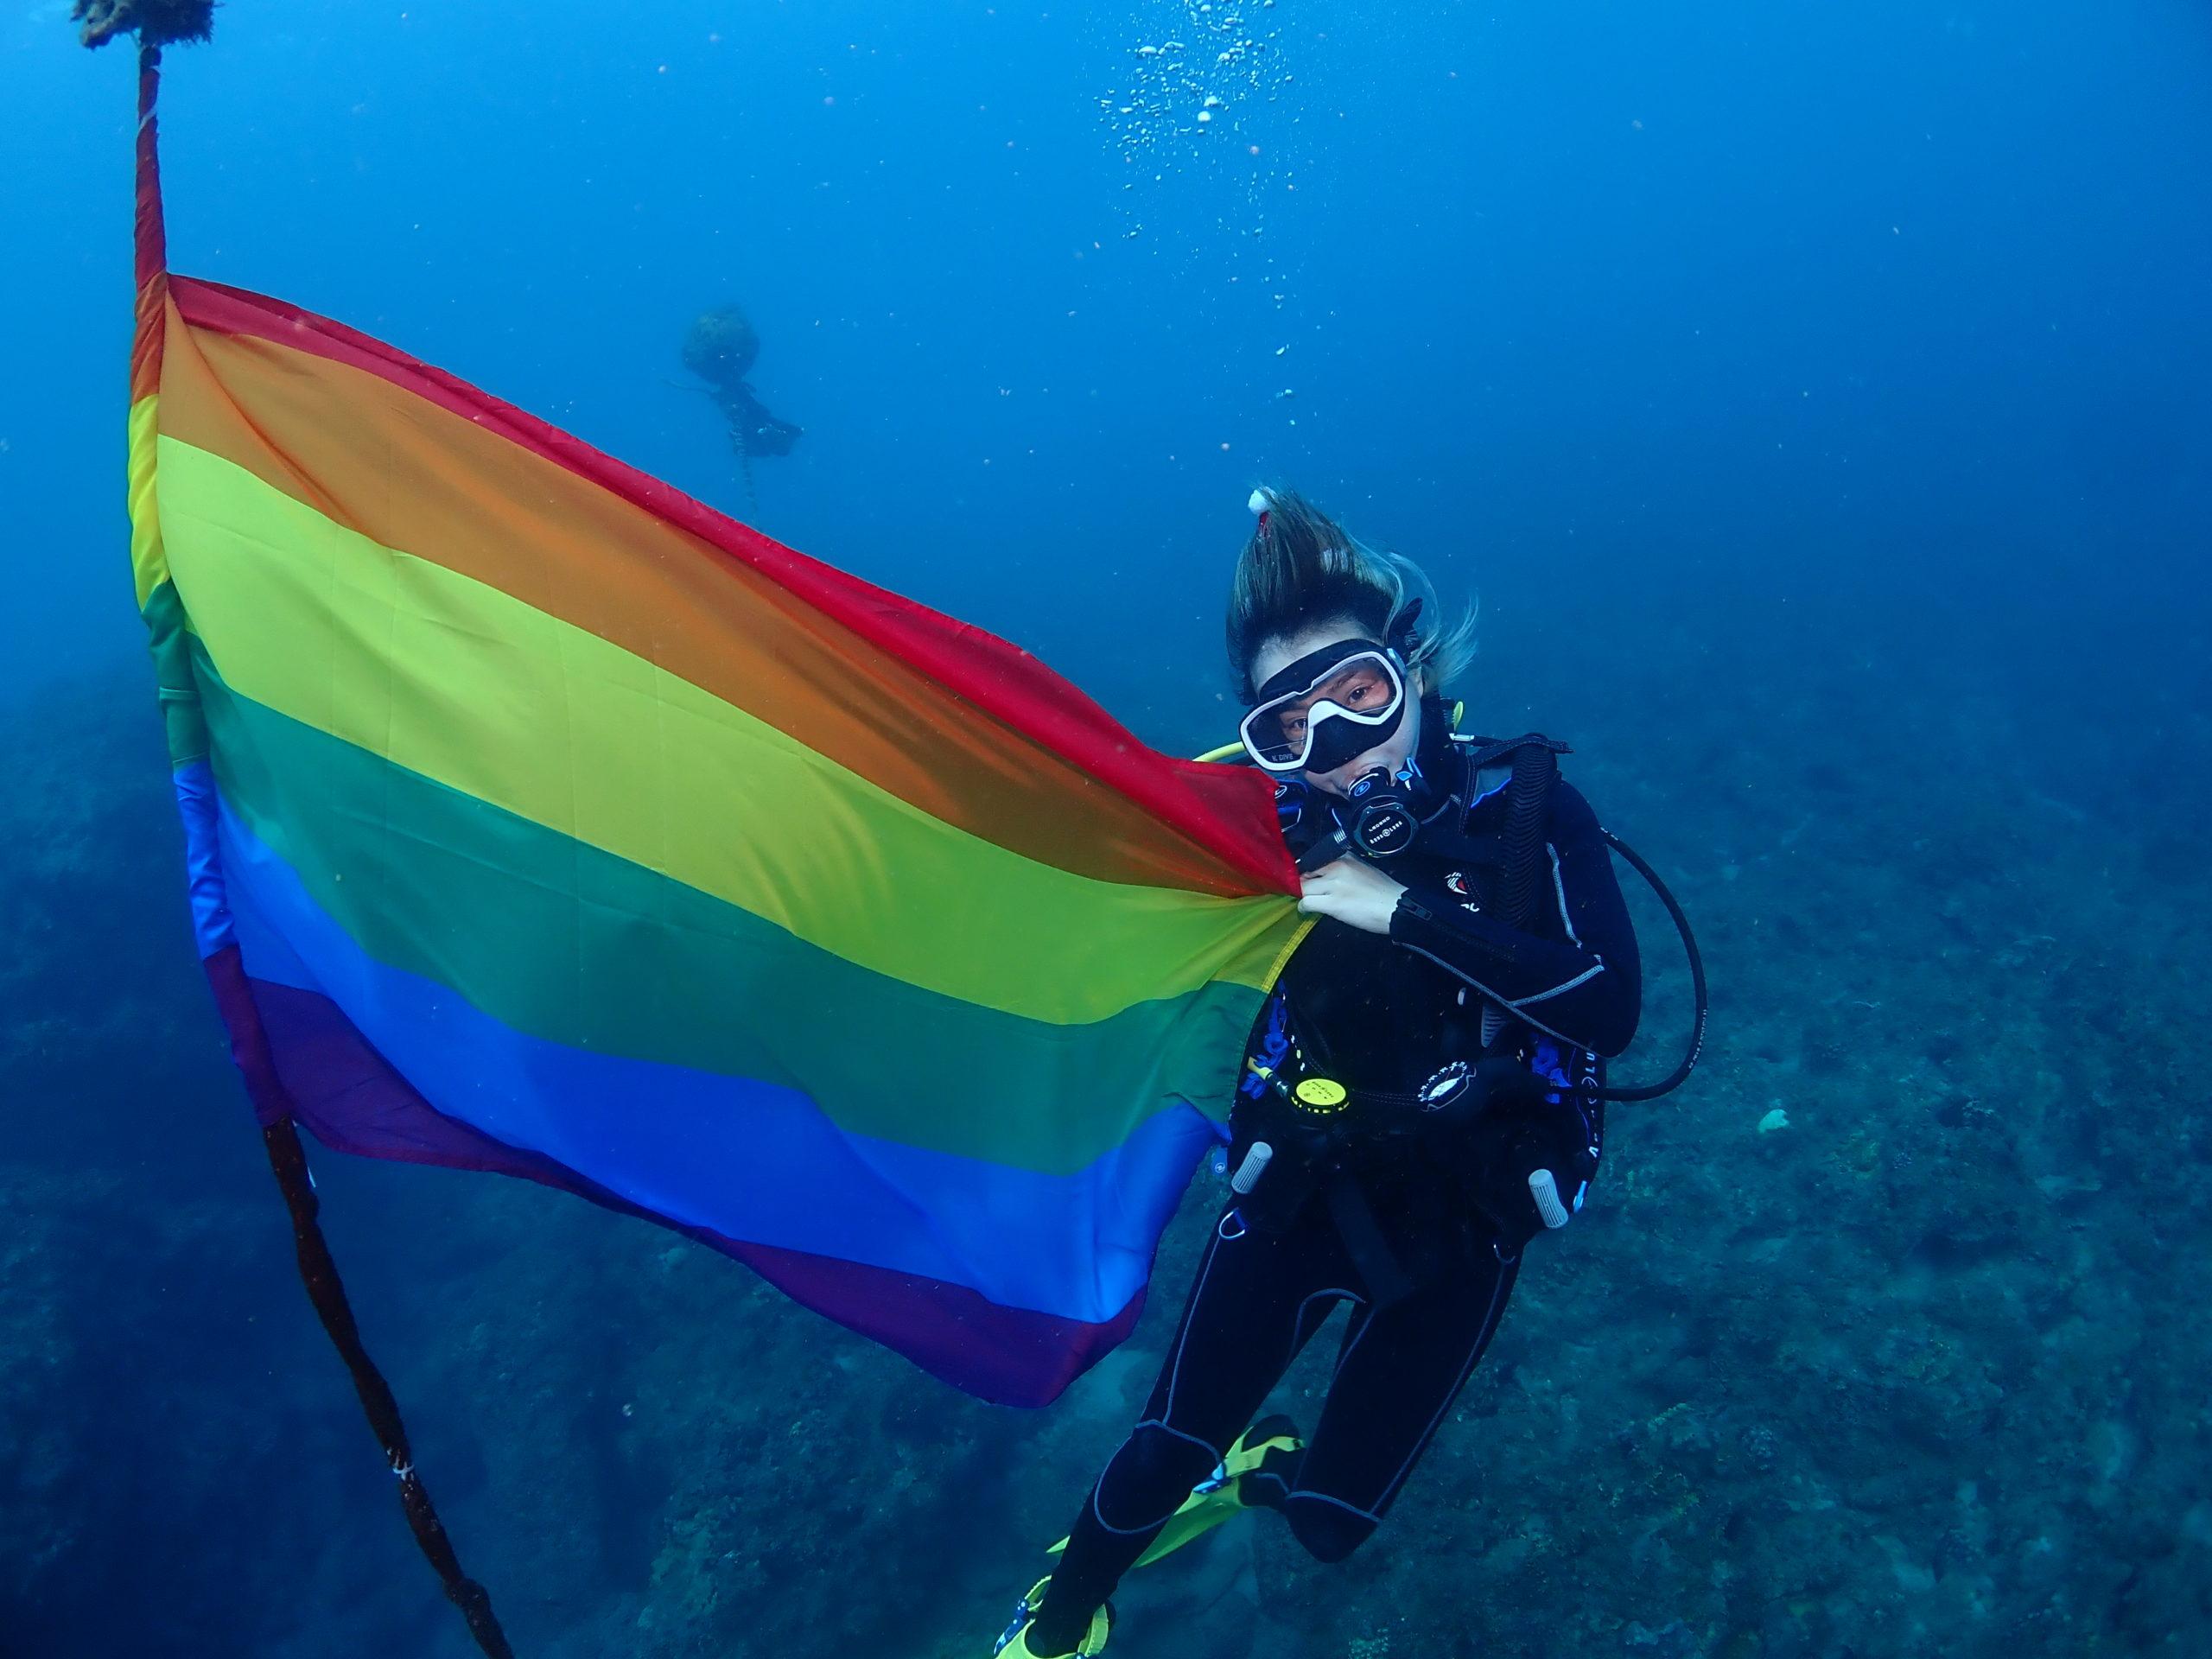 水下彩虹旗